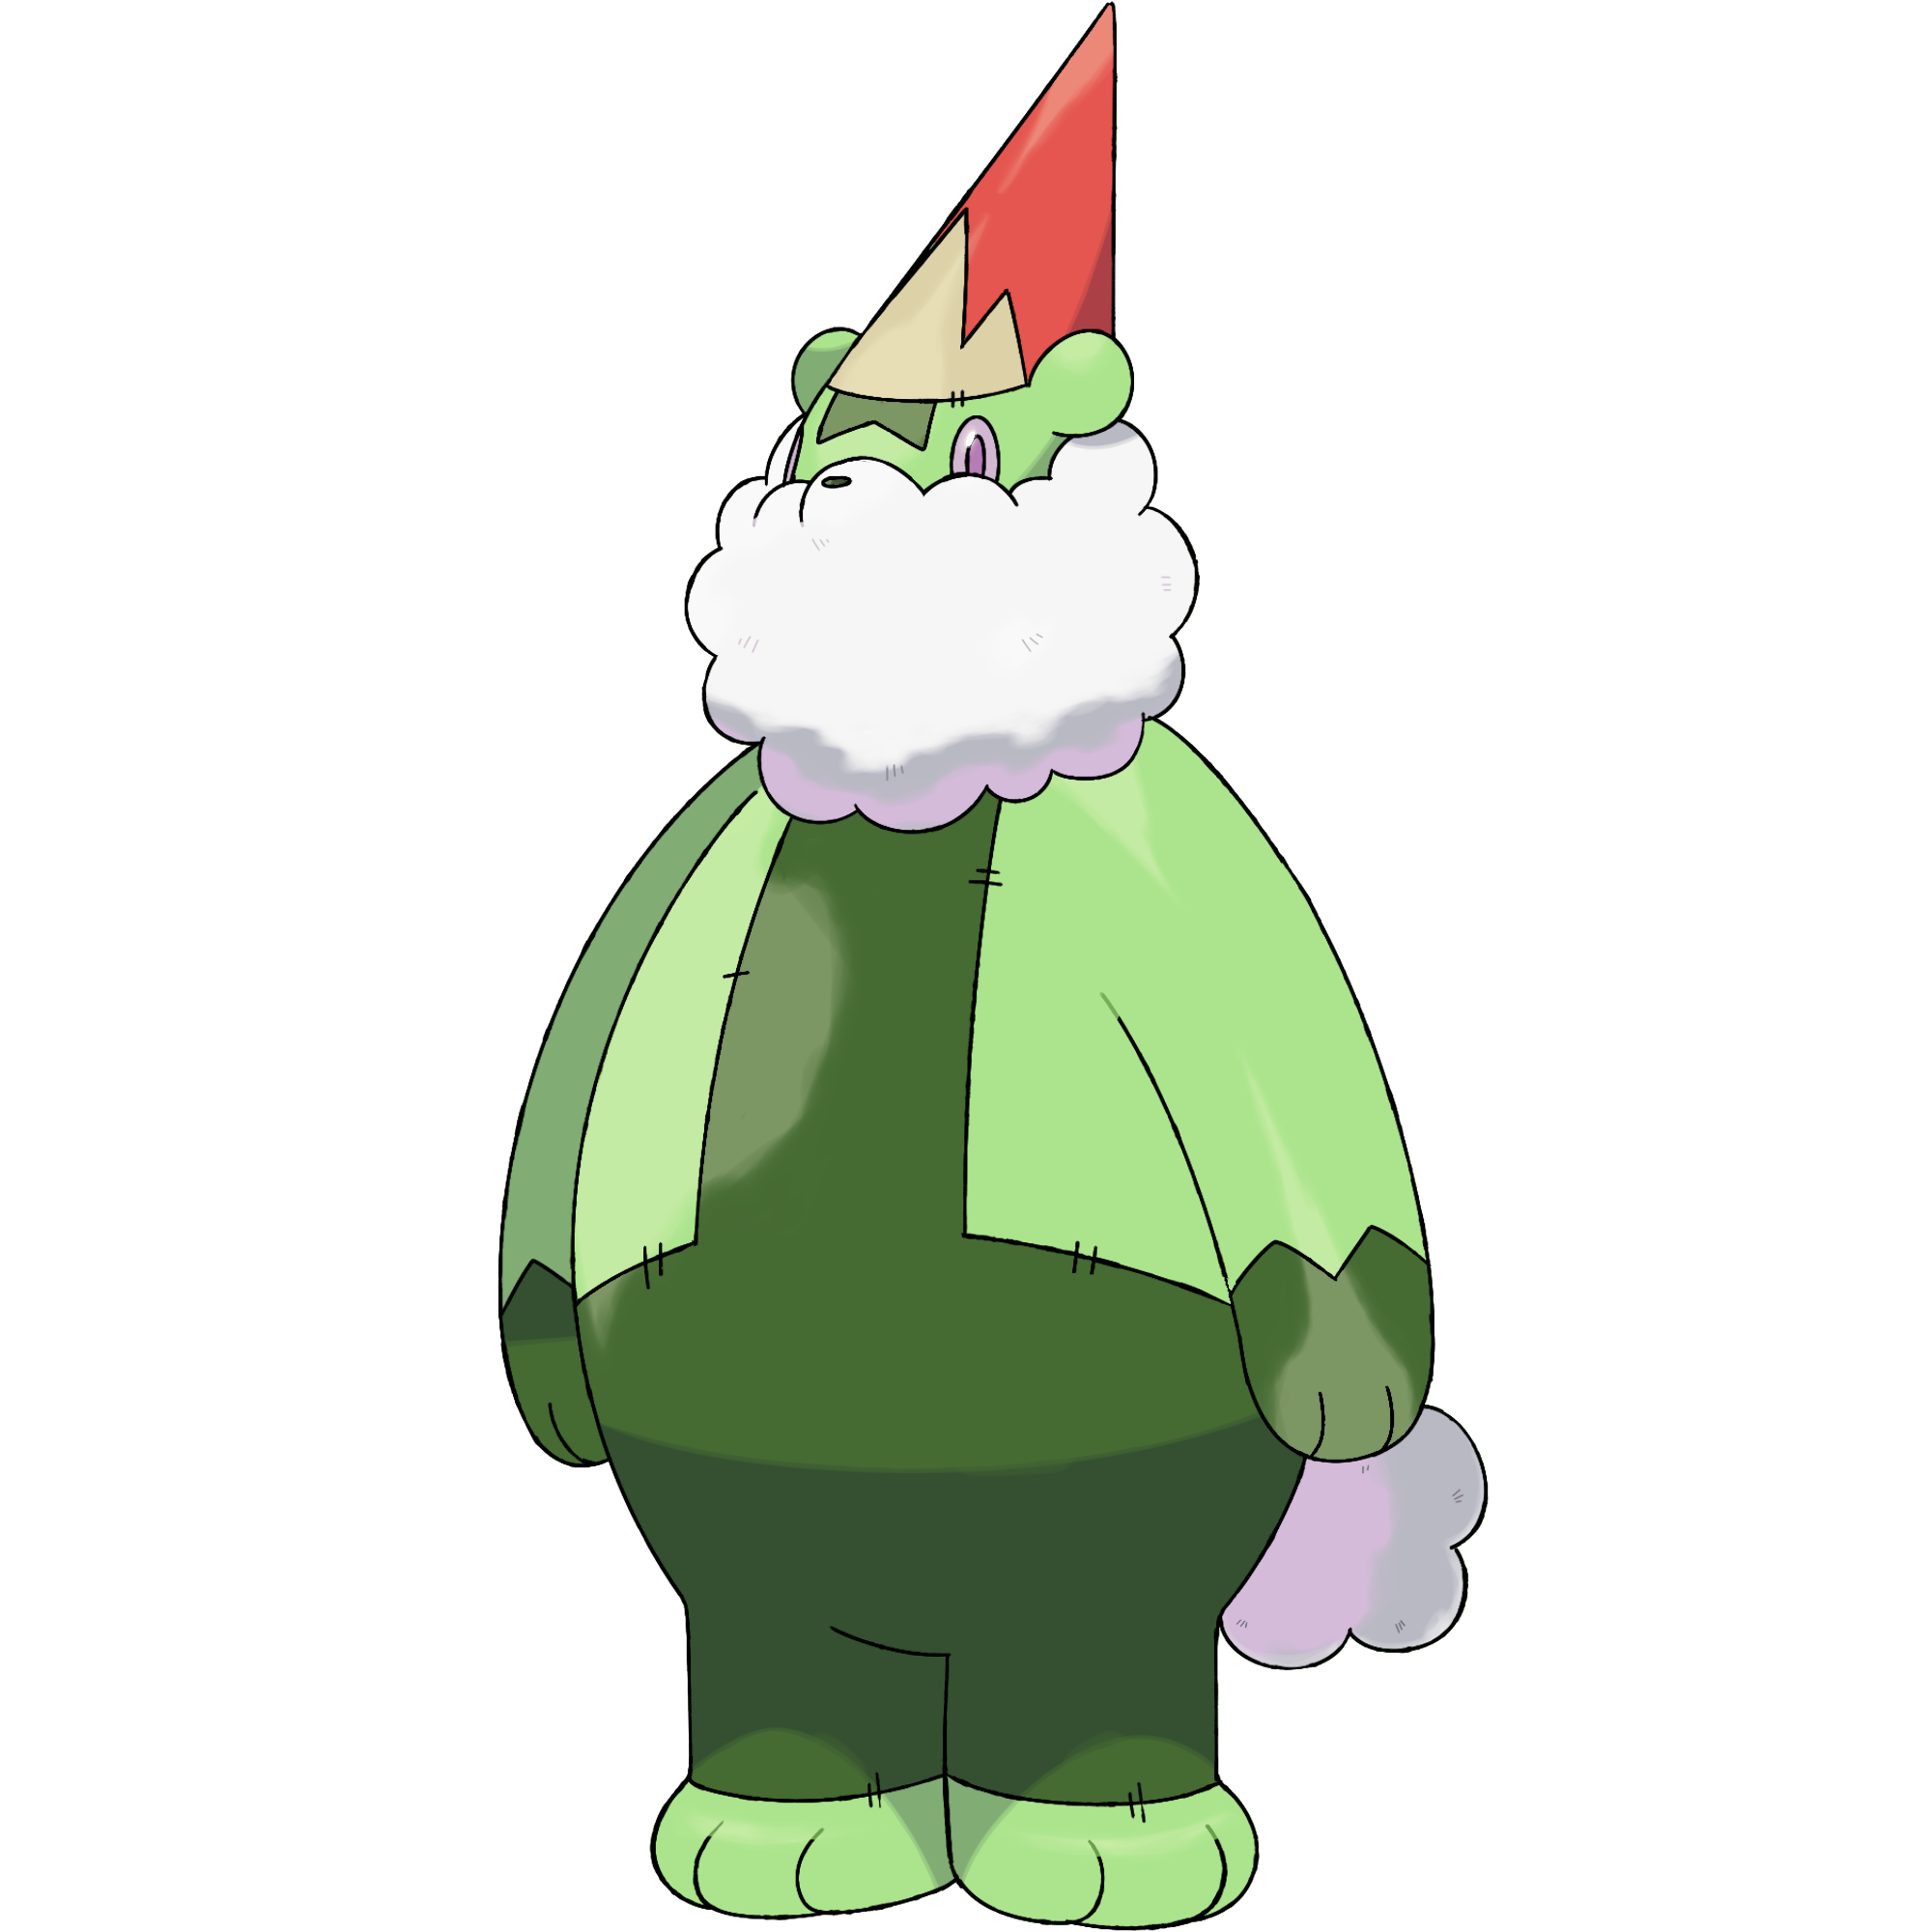 Gnome clipart lawn. Image zwursa png darkandwindie